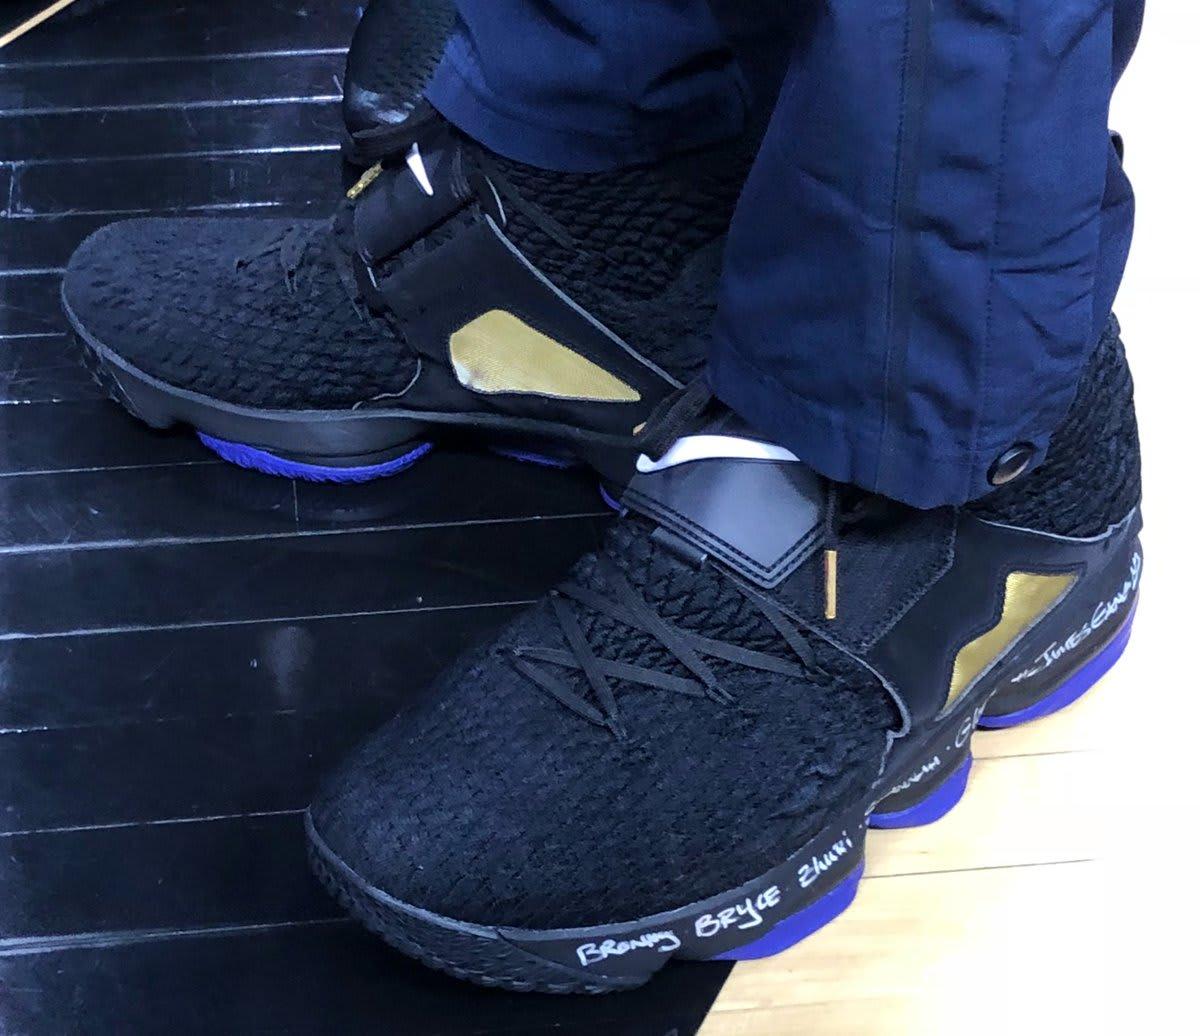 best service d5fa3 9e435 LeBron James Wears Nike LeBron 15 'Diamond Turf' in Black ...